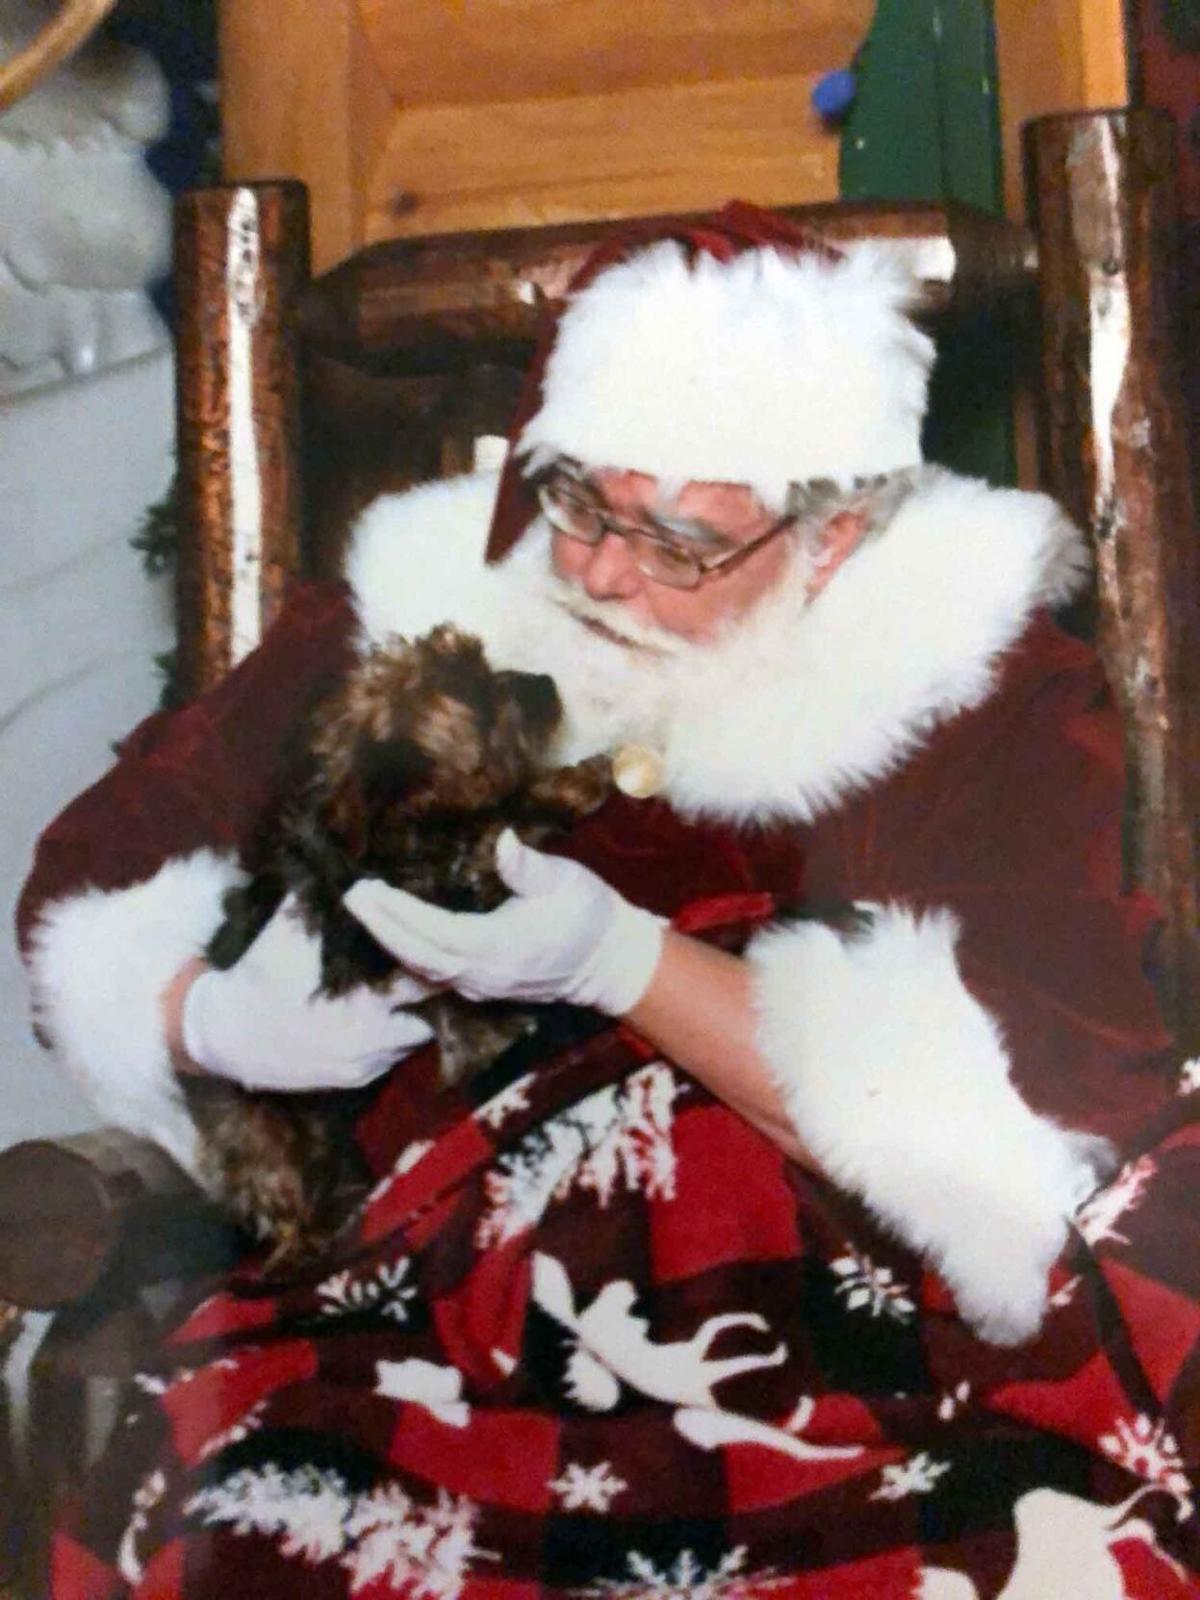 A visit wth Santa